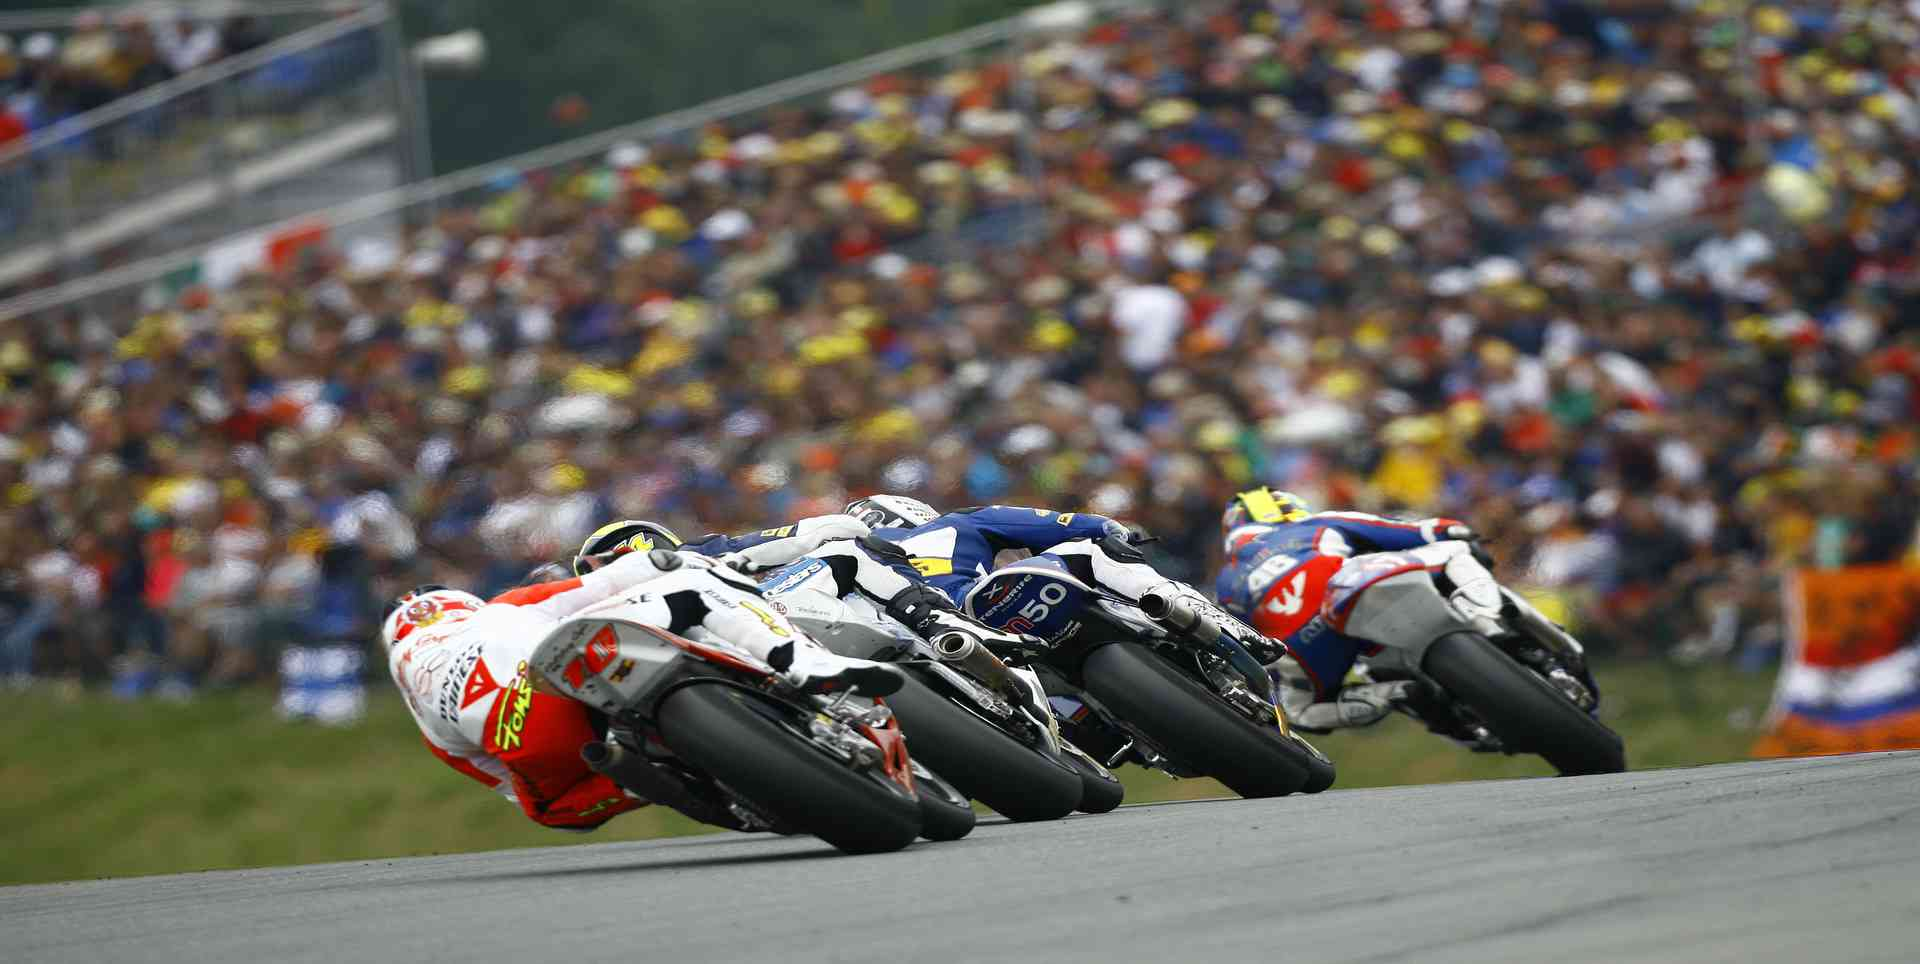 watch-pirelli-aragon-superbike-world-championship-live